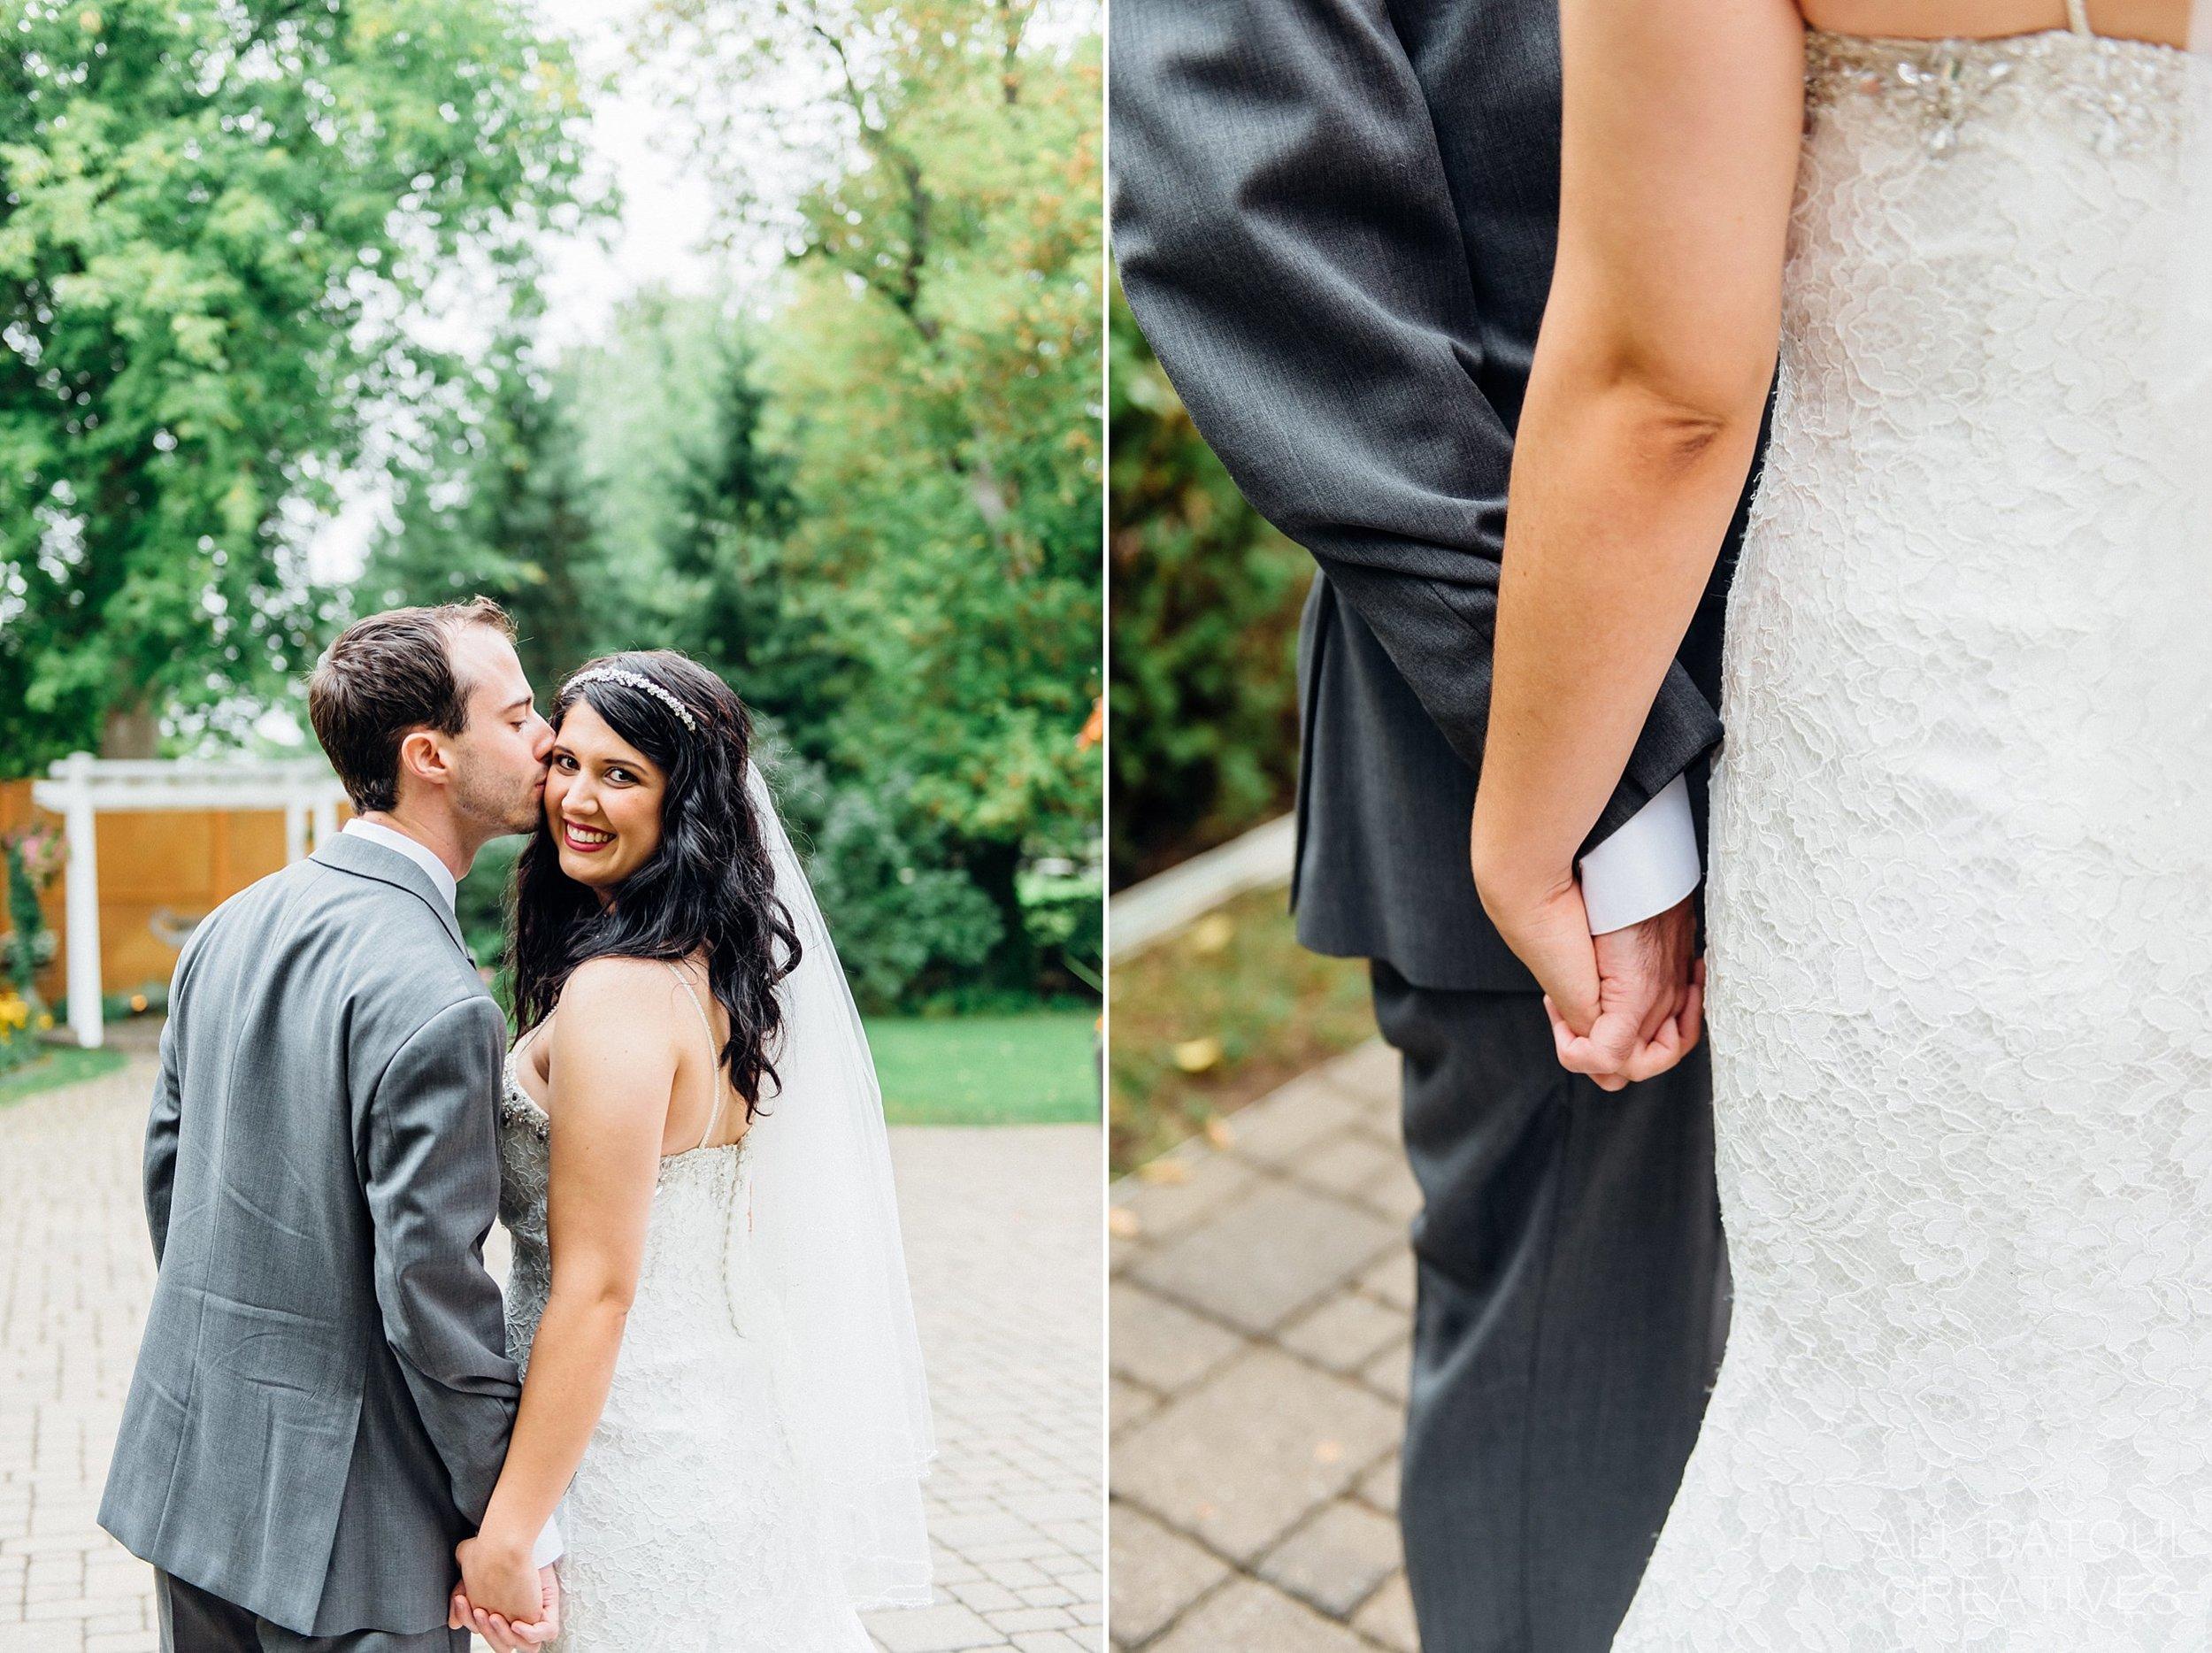 Jocelyn + Steve At The Schoolhouse Wedding - Ali and Batoul Fine Art Wedding Photography_0036.jpg